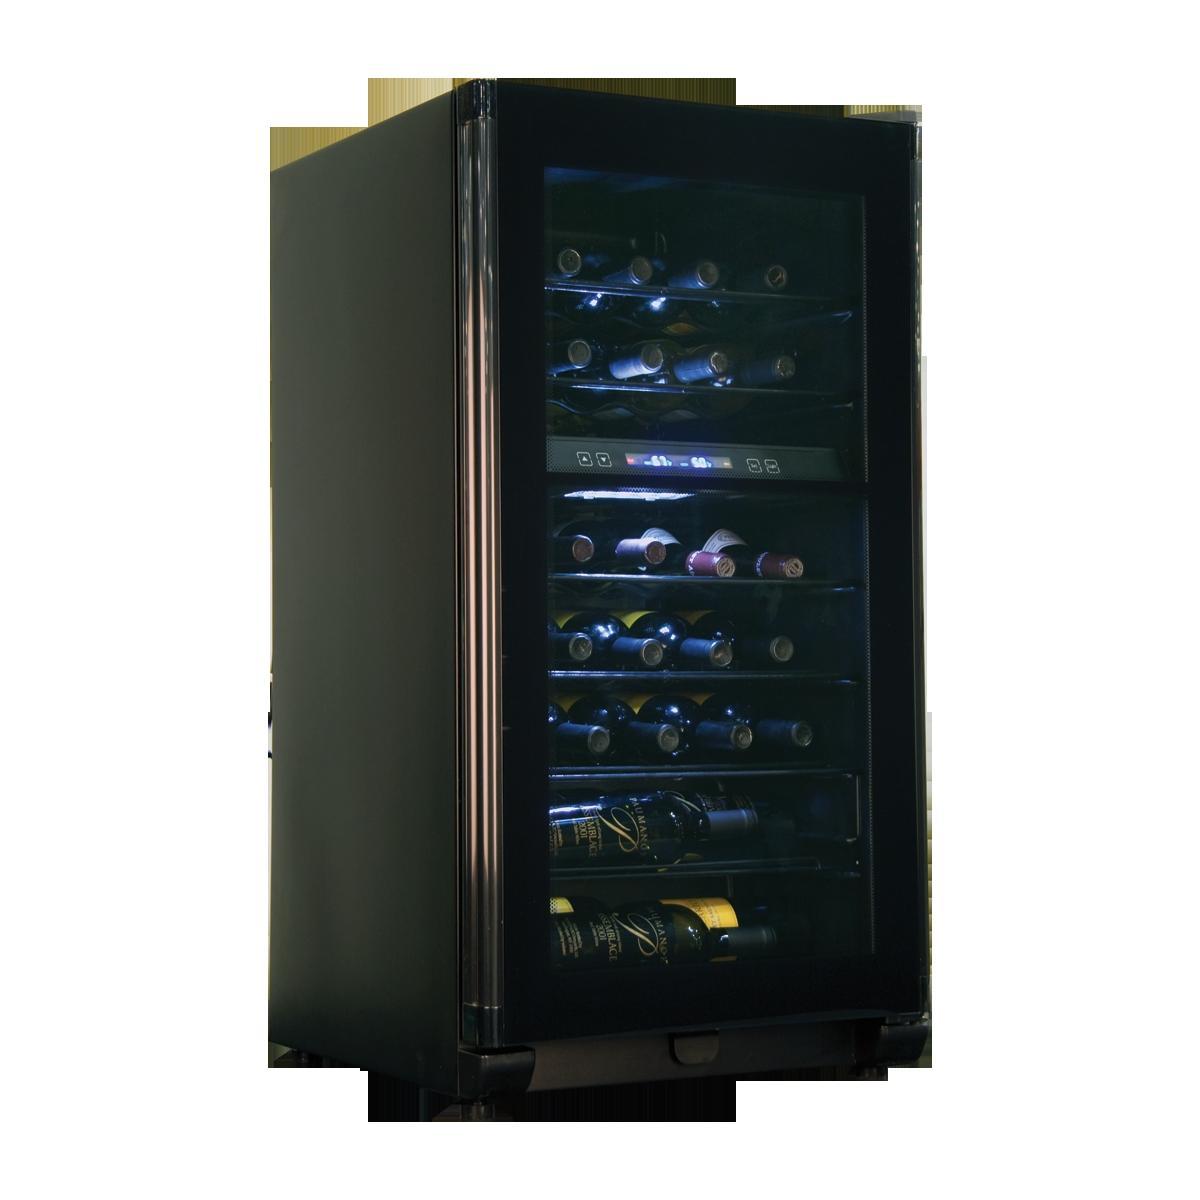 Hvfe040bbb haier hvfe040bbb full size wine coolers Wine cooler brands